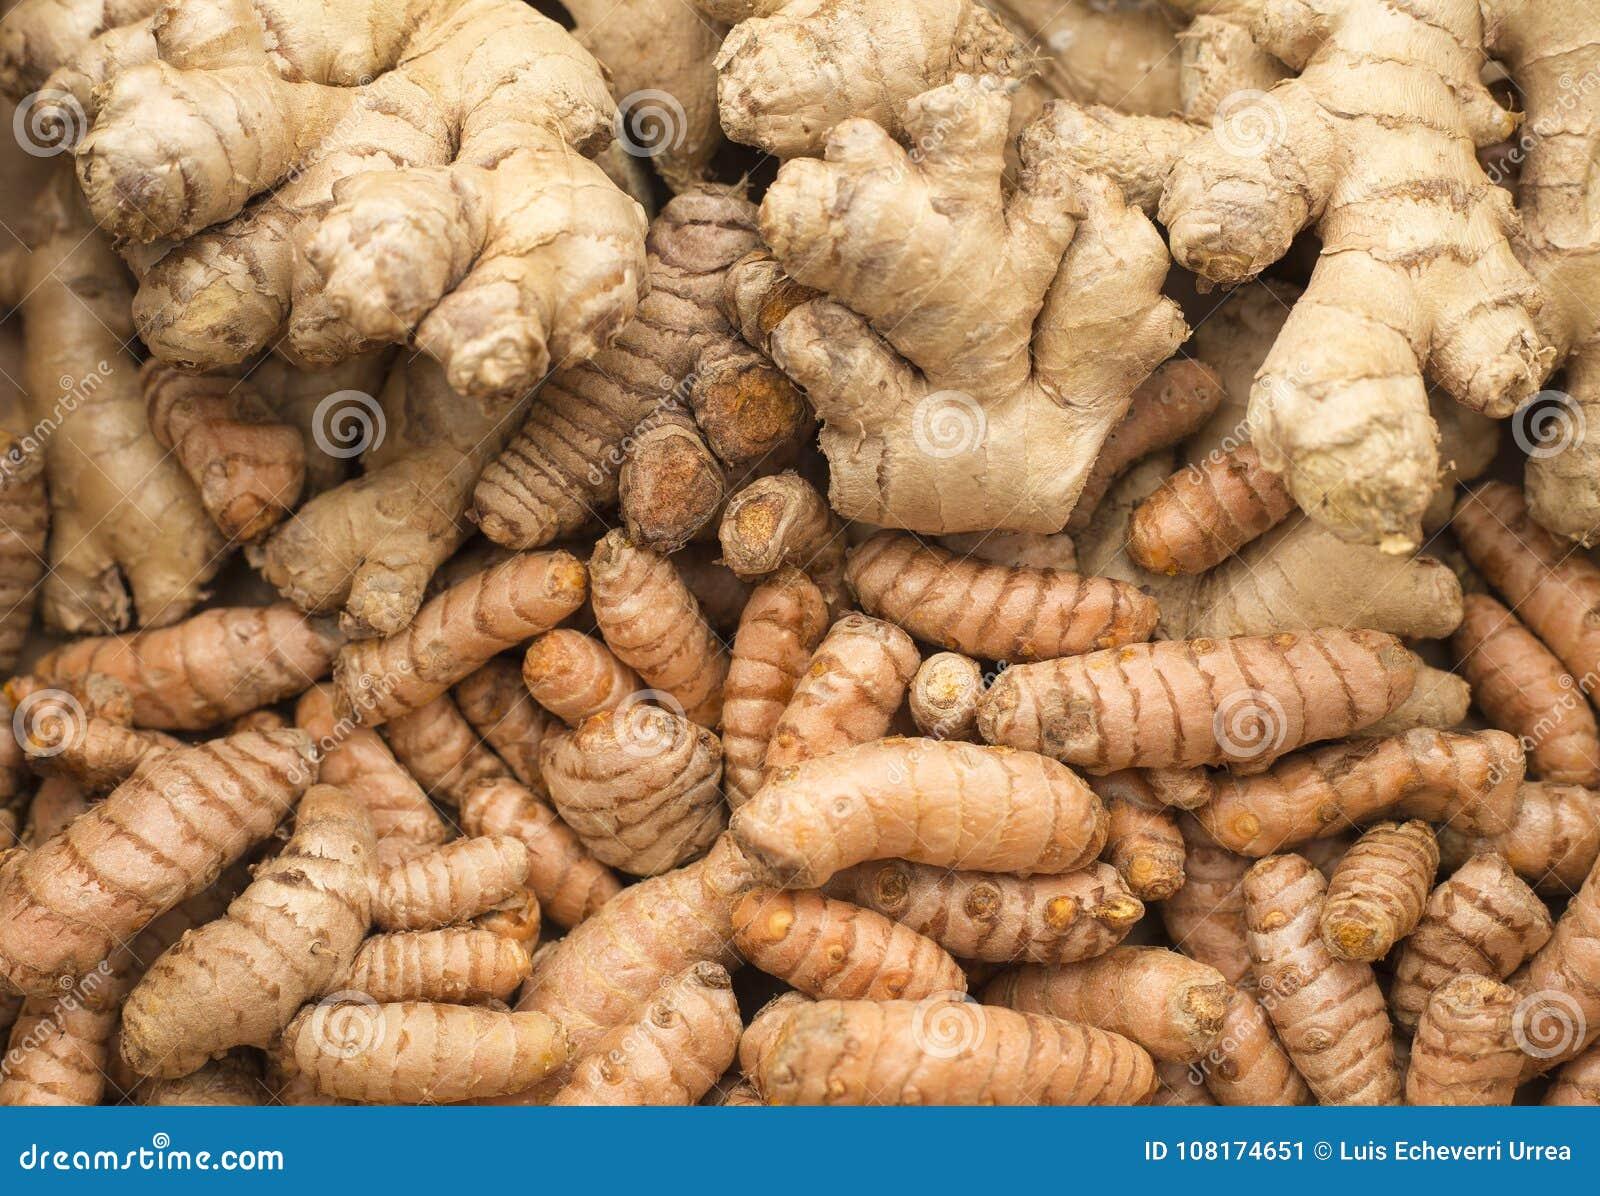 Roots Of Turmeric And Ginger  Curcuma Longa And Zingiber